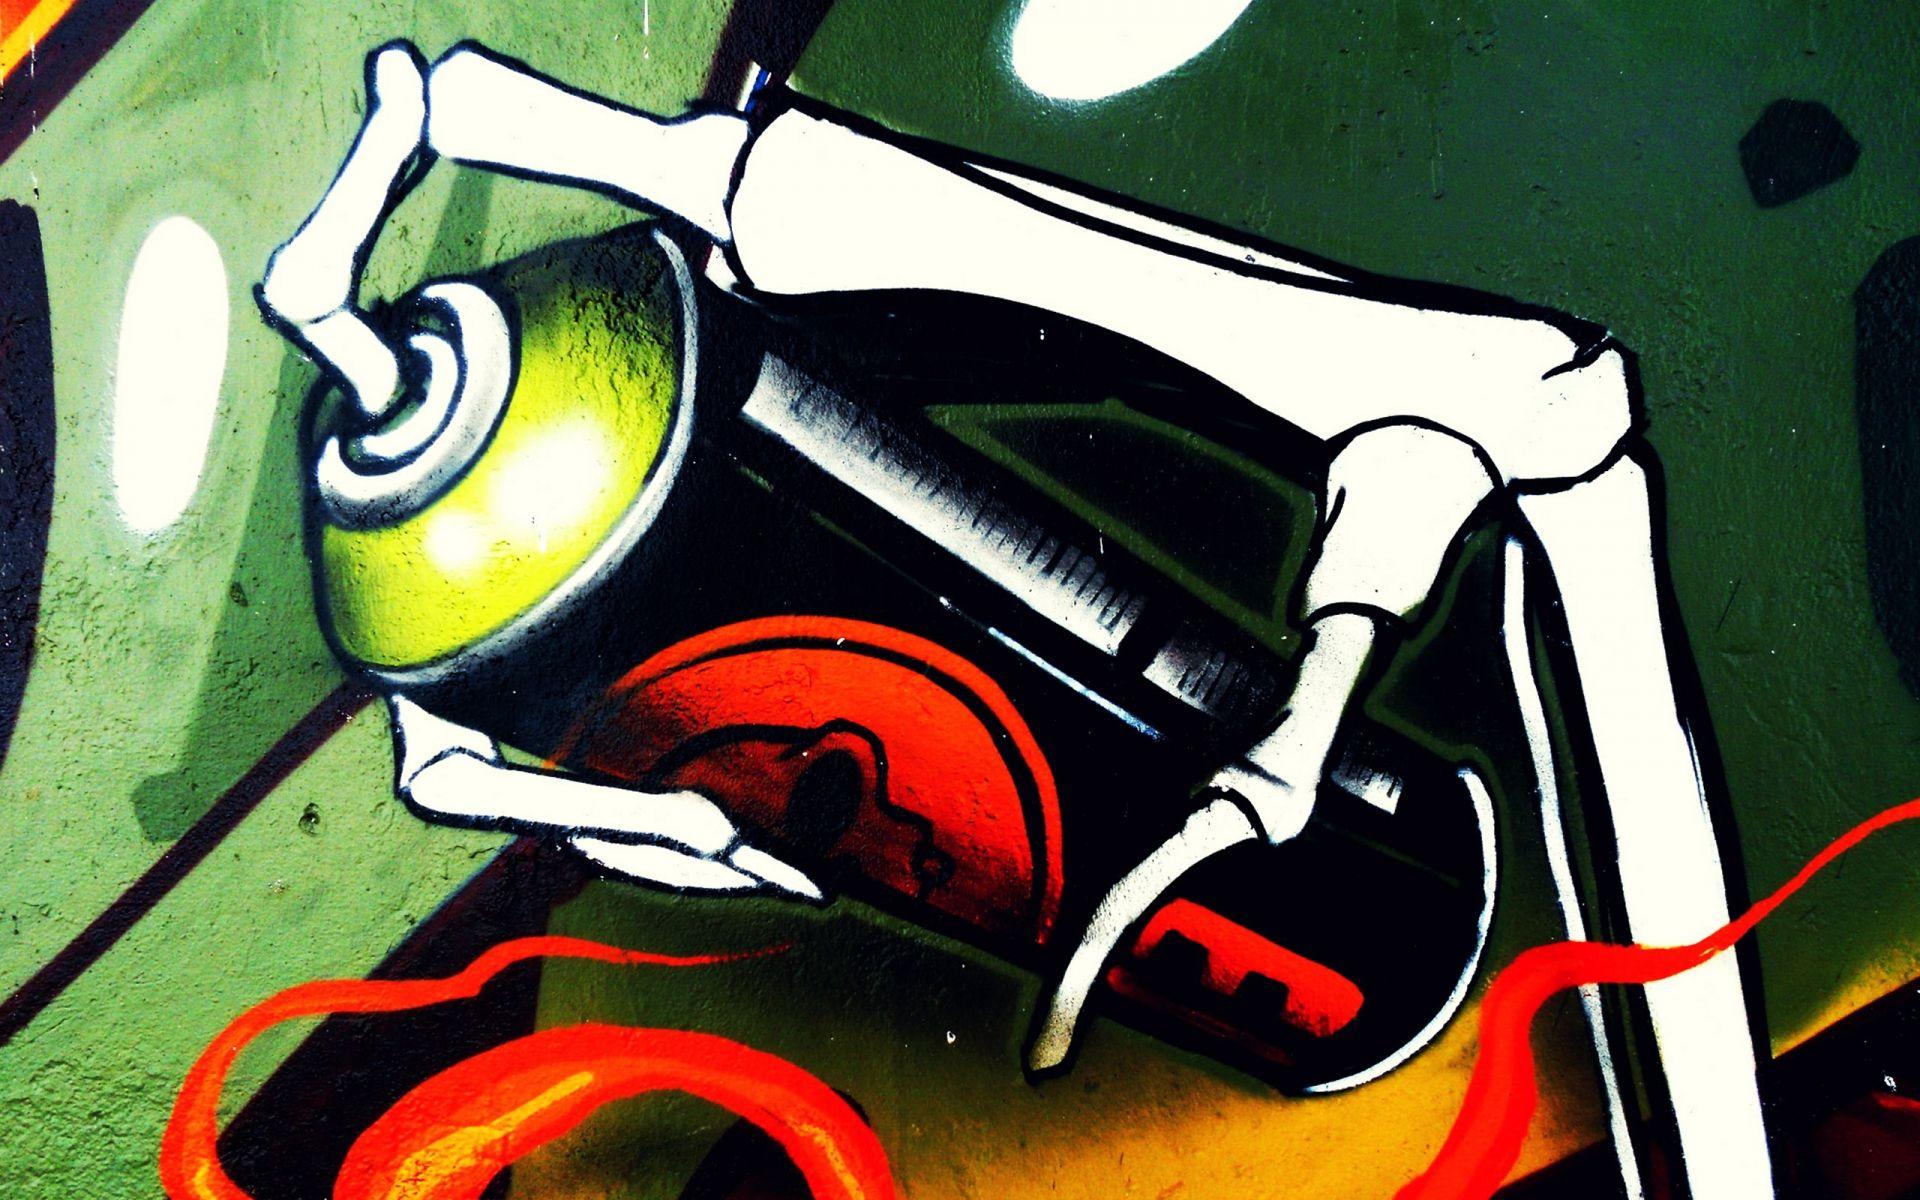 Beautiful Graffiti Wallpapers For Your Desktop Creative Hd Wallpapers Pinterest Graffiti